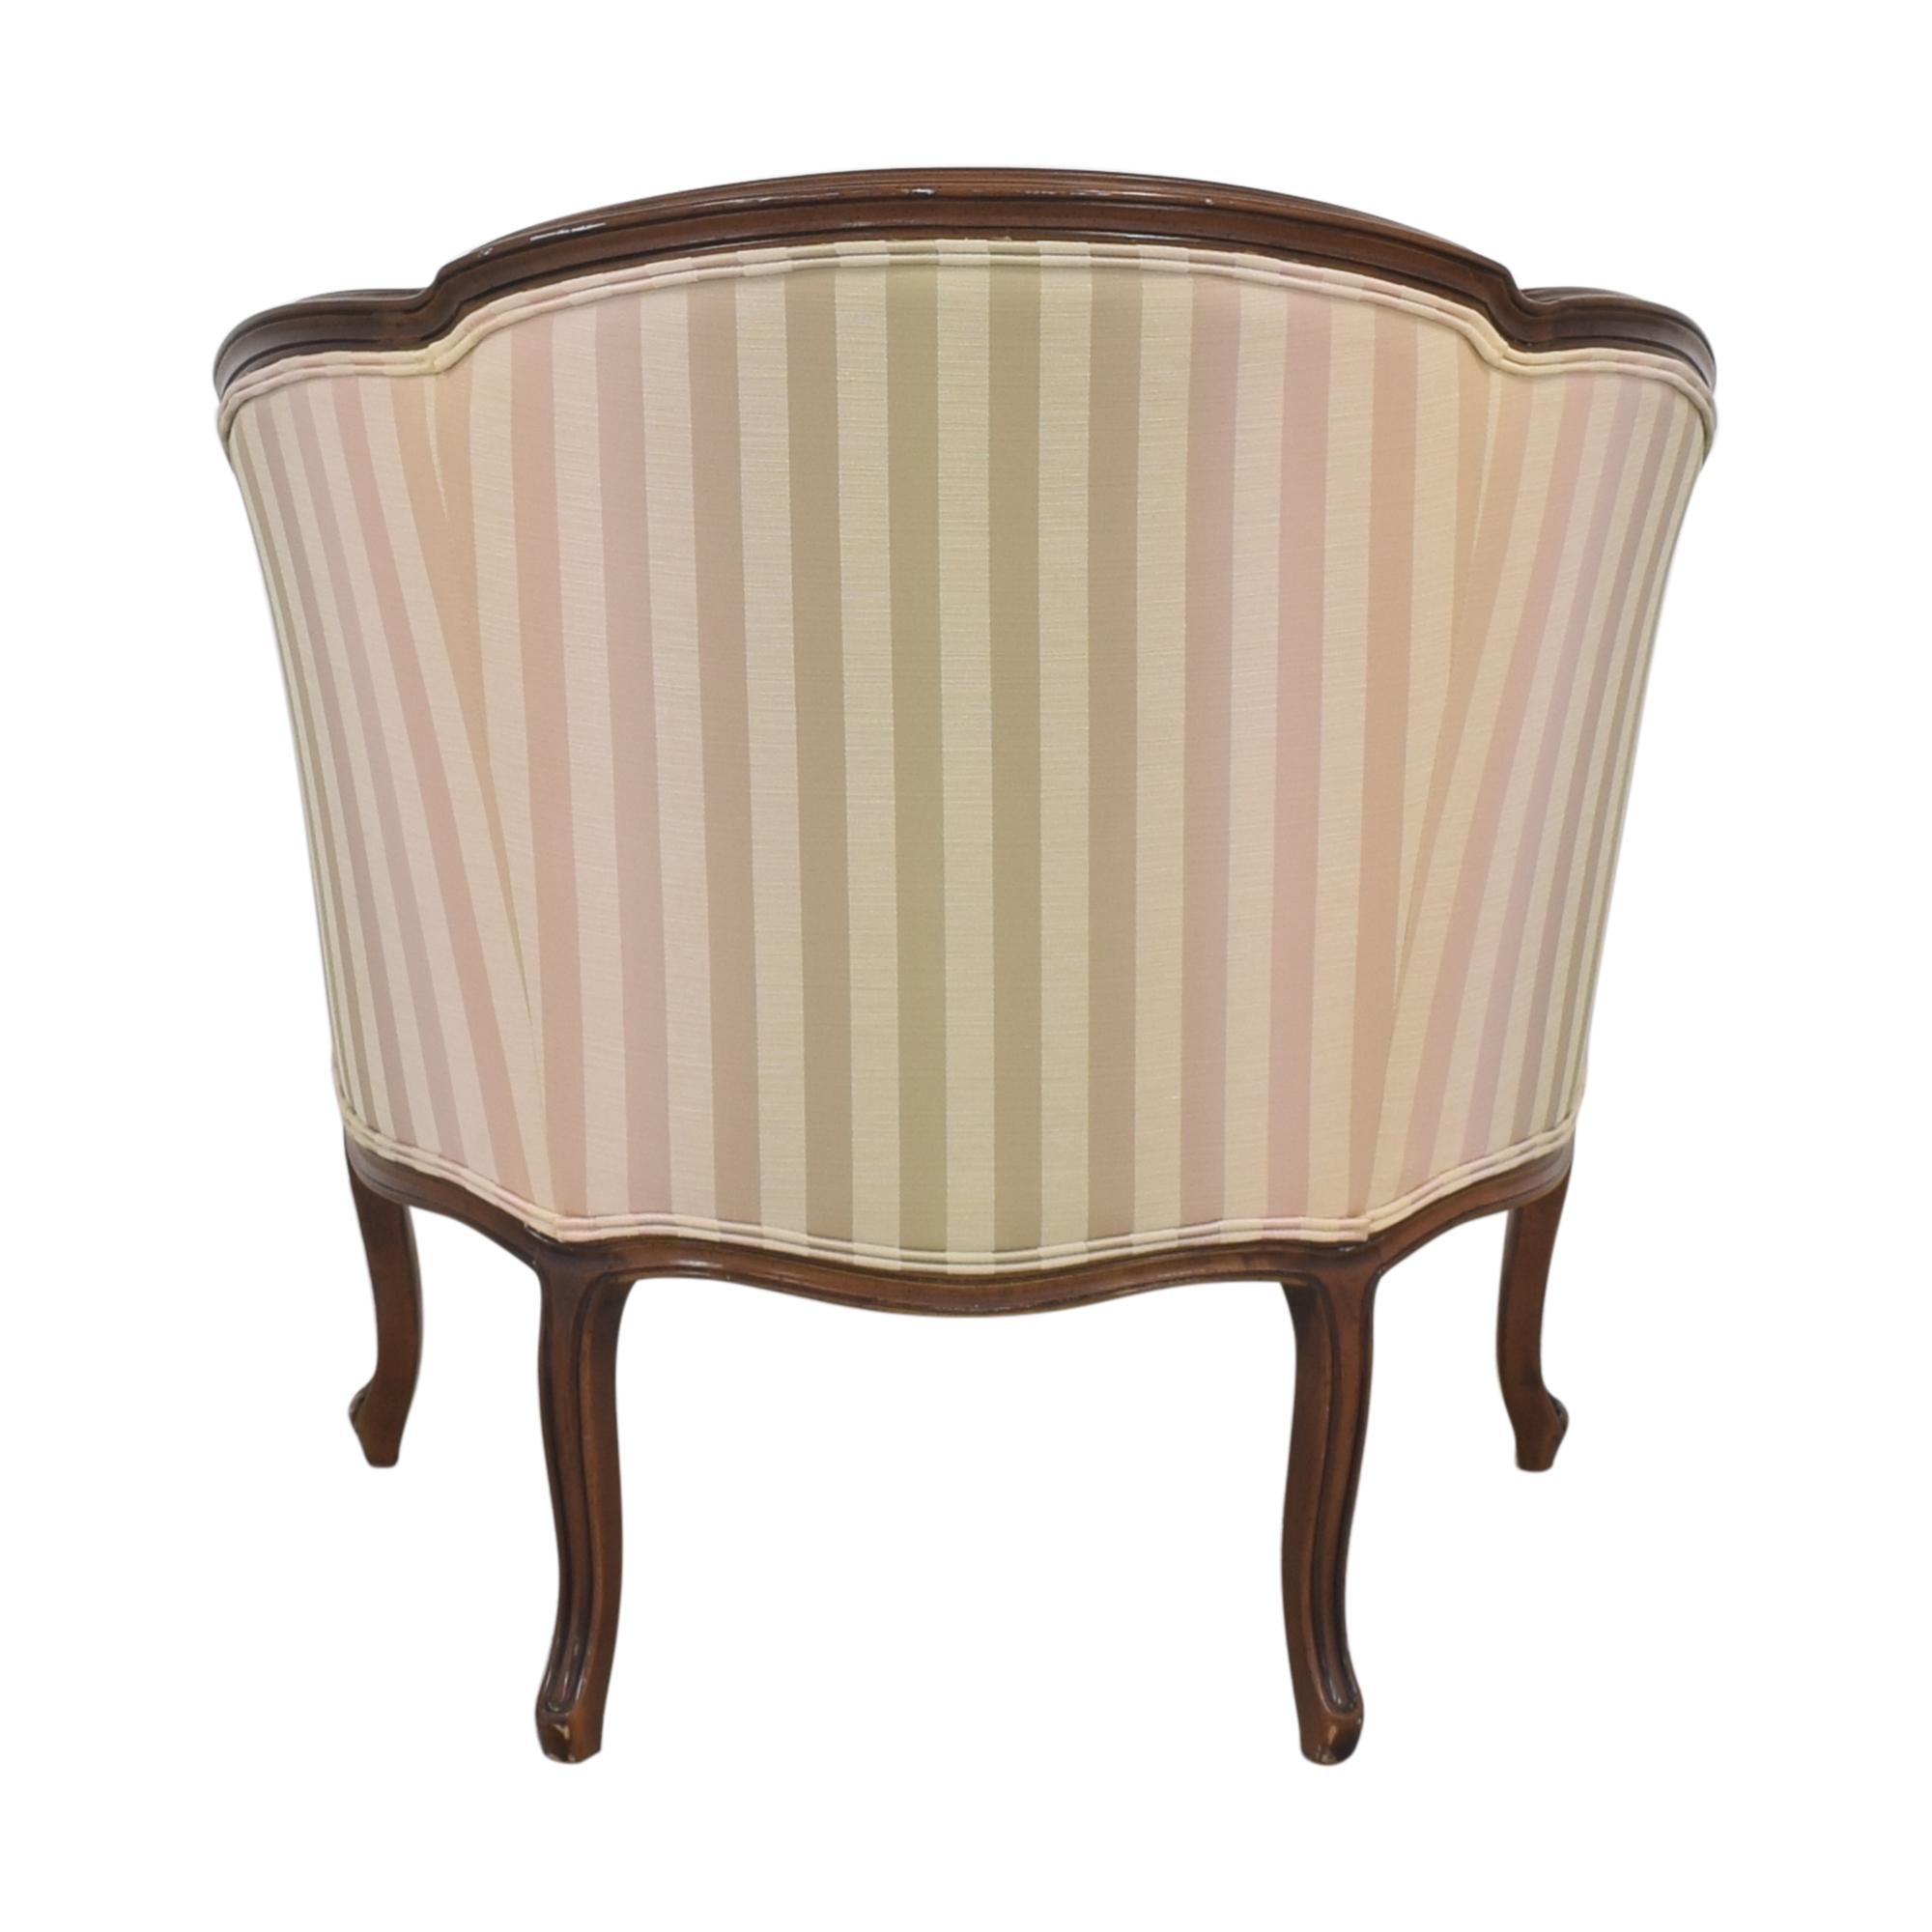 Century Furniture Century Furniture Barrel Accent Chair second hand